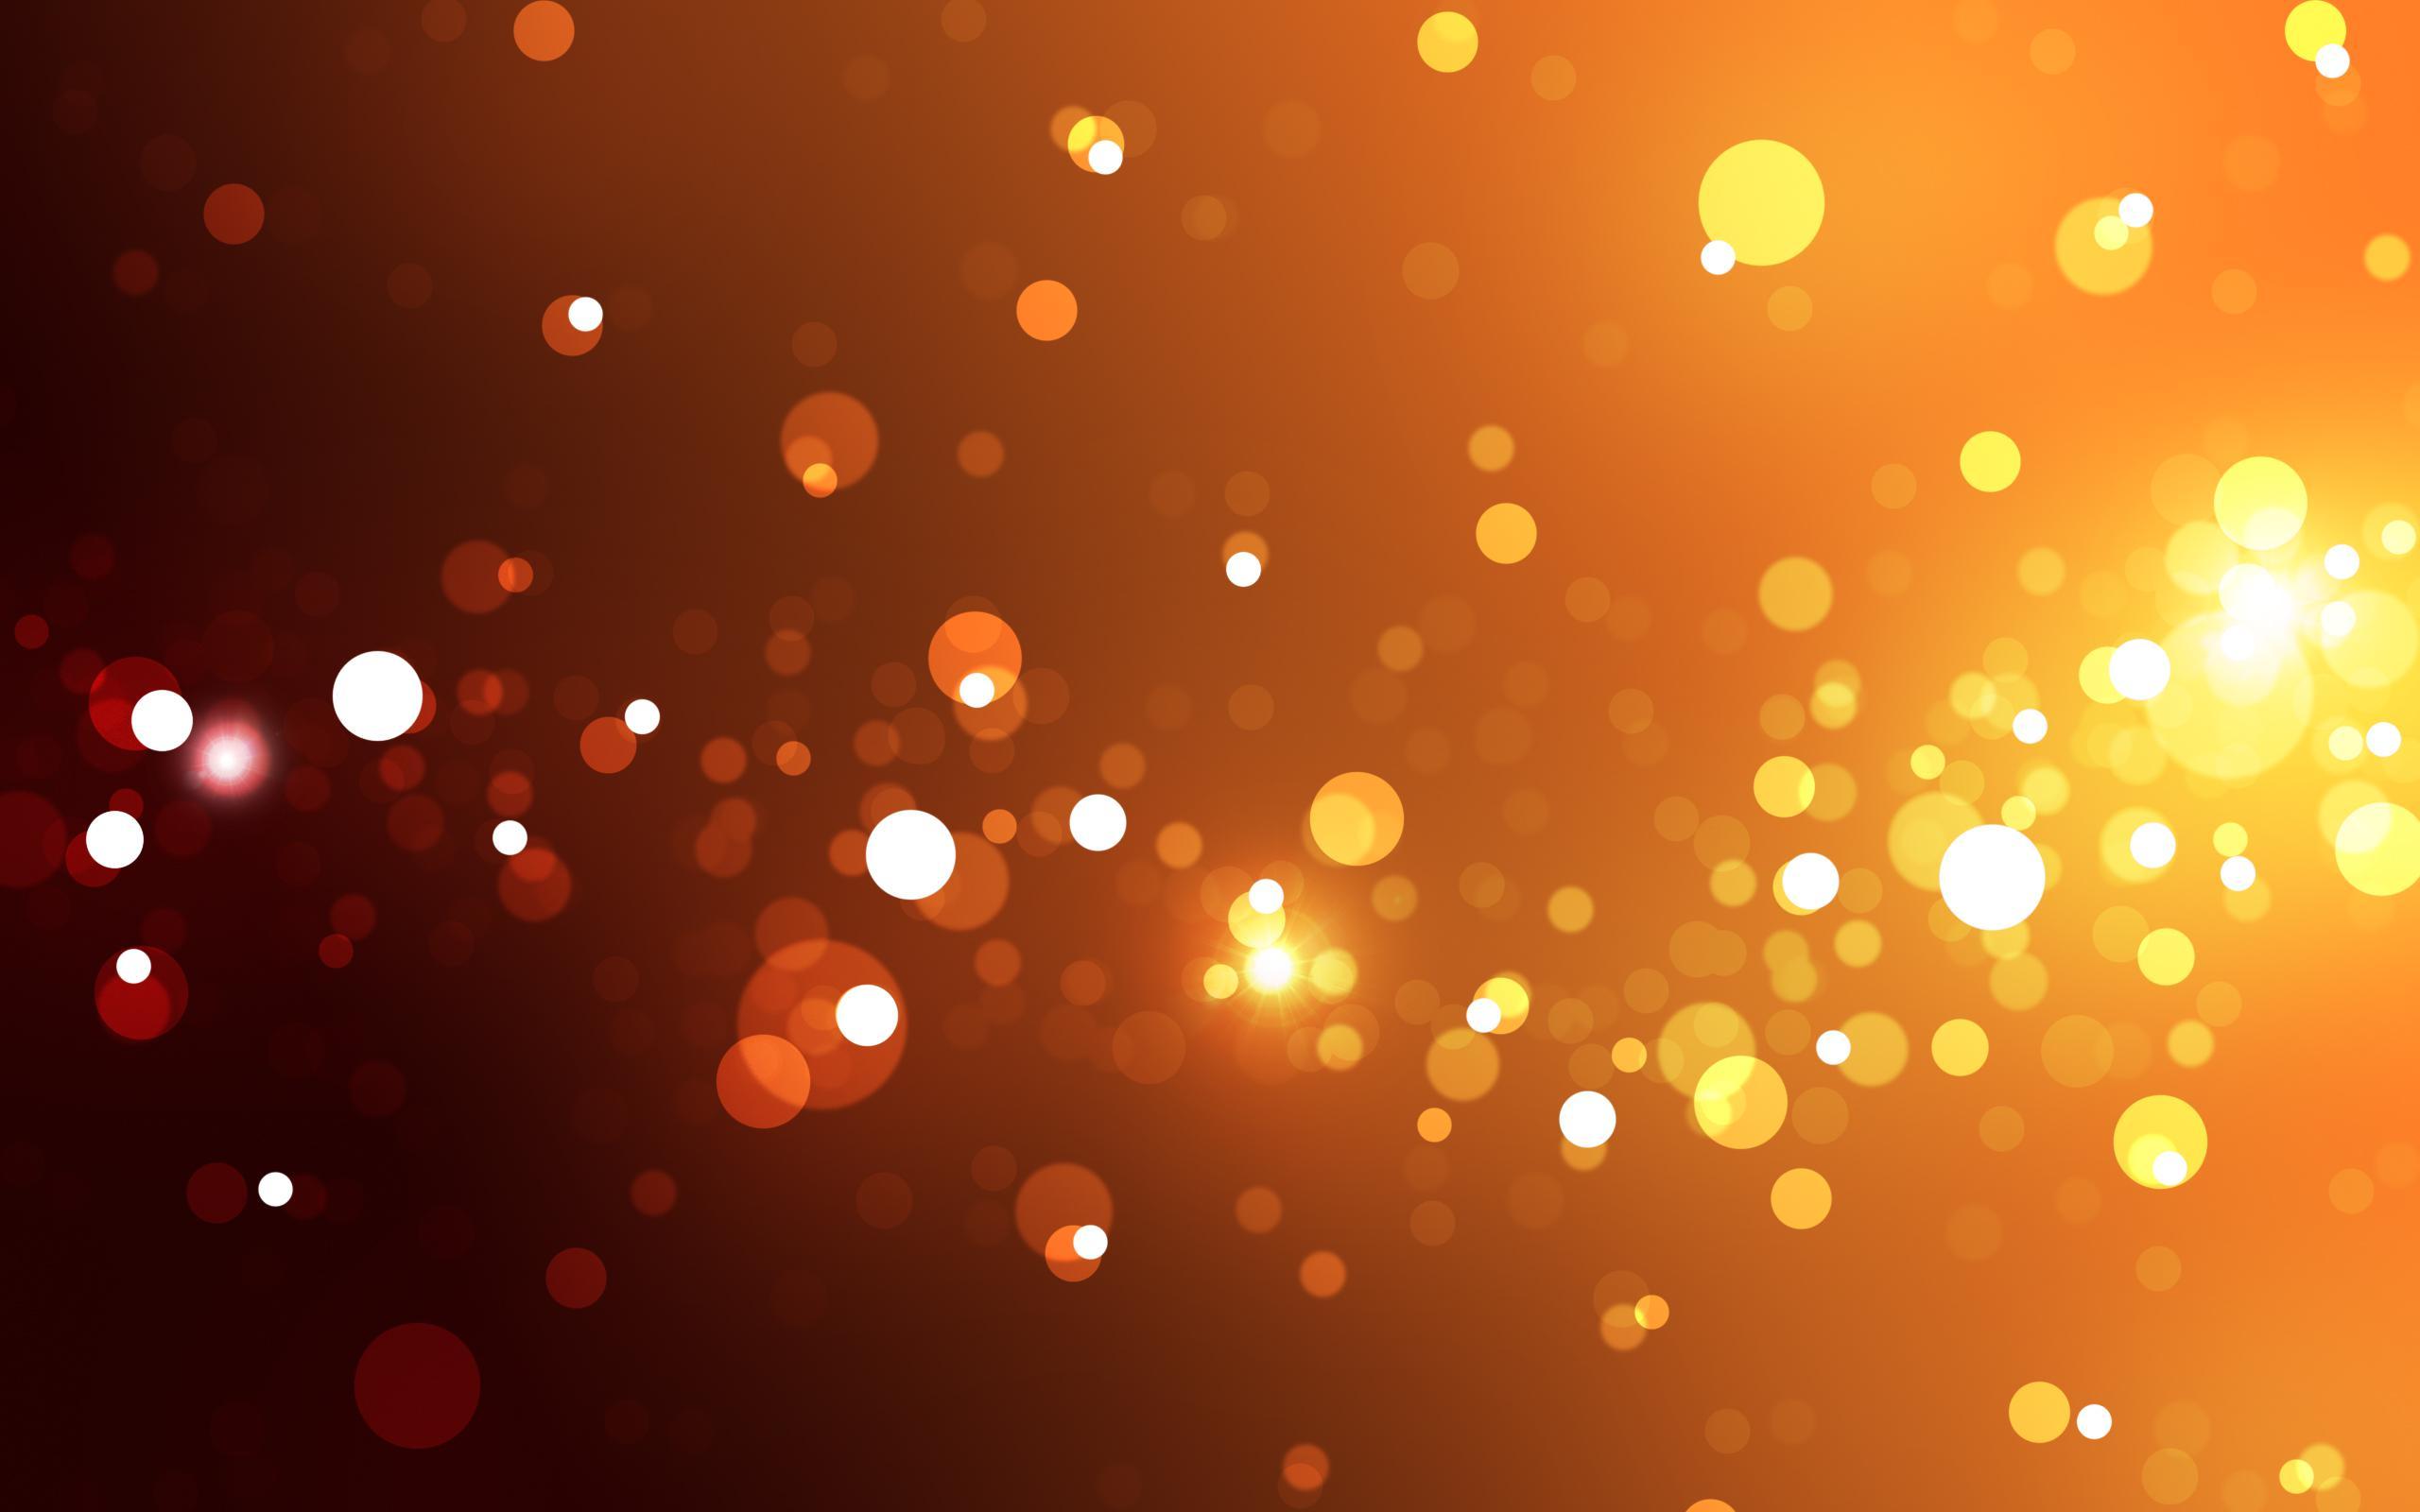 bokeh_orange_light_hd  DageMTI